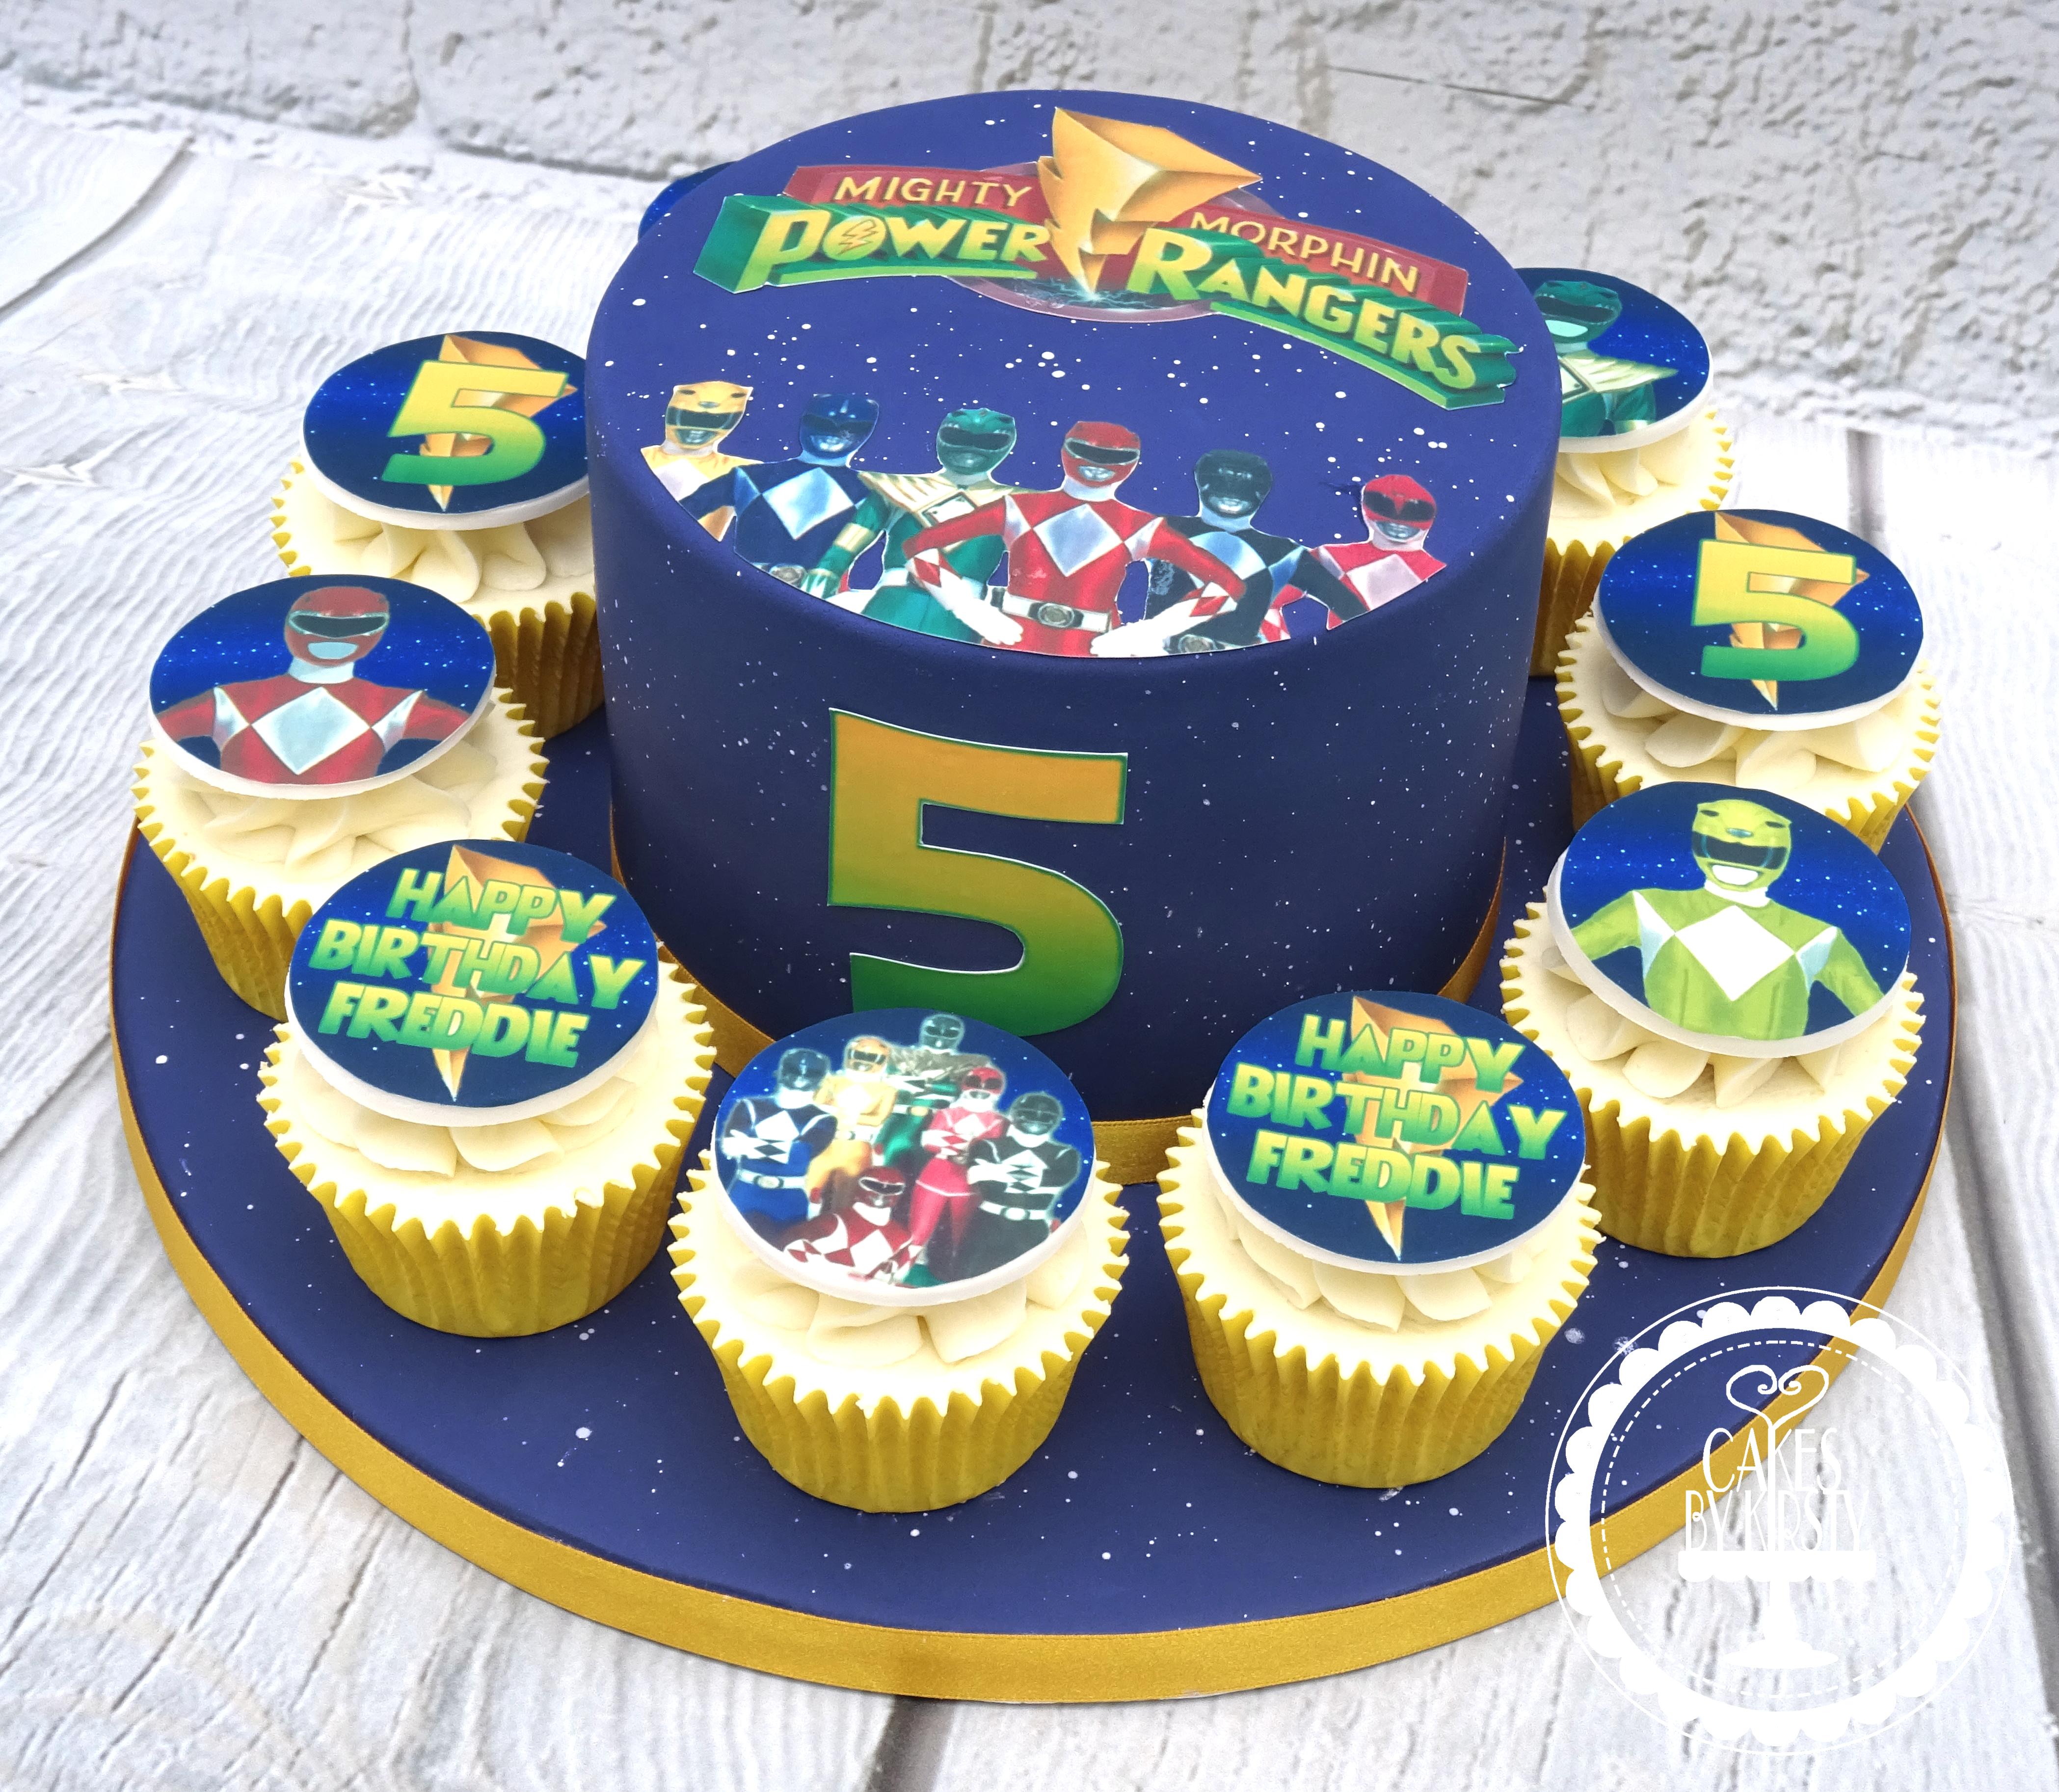 Power Rangers Cake & Cupcakes